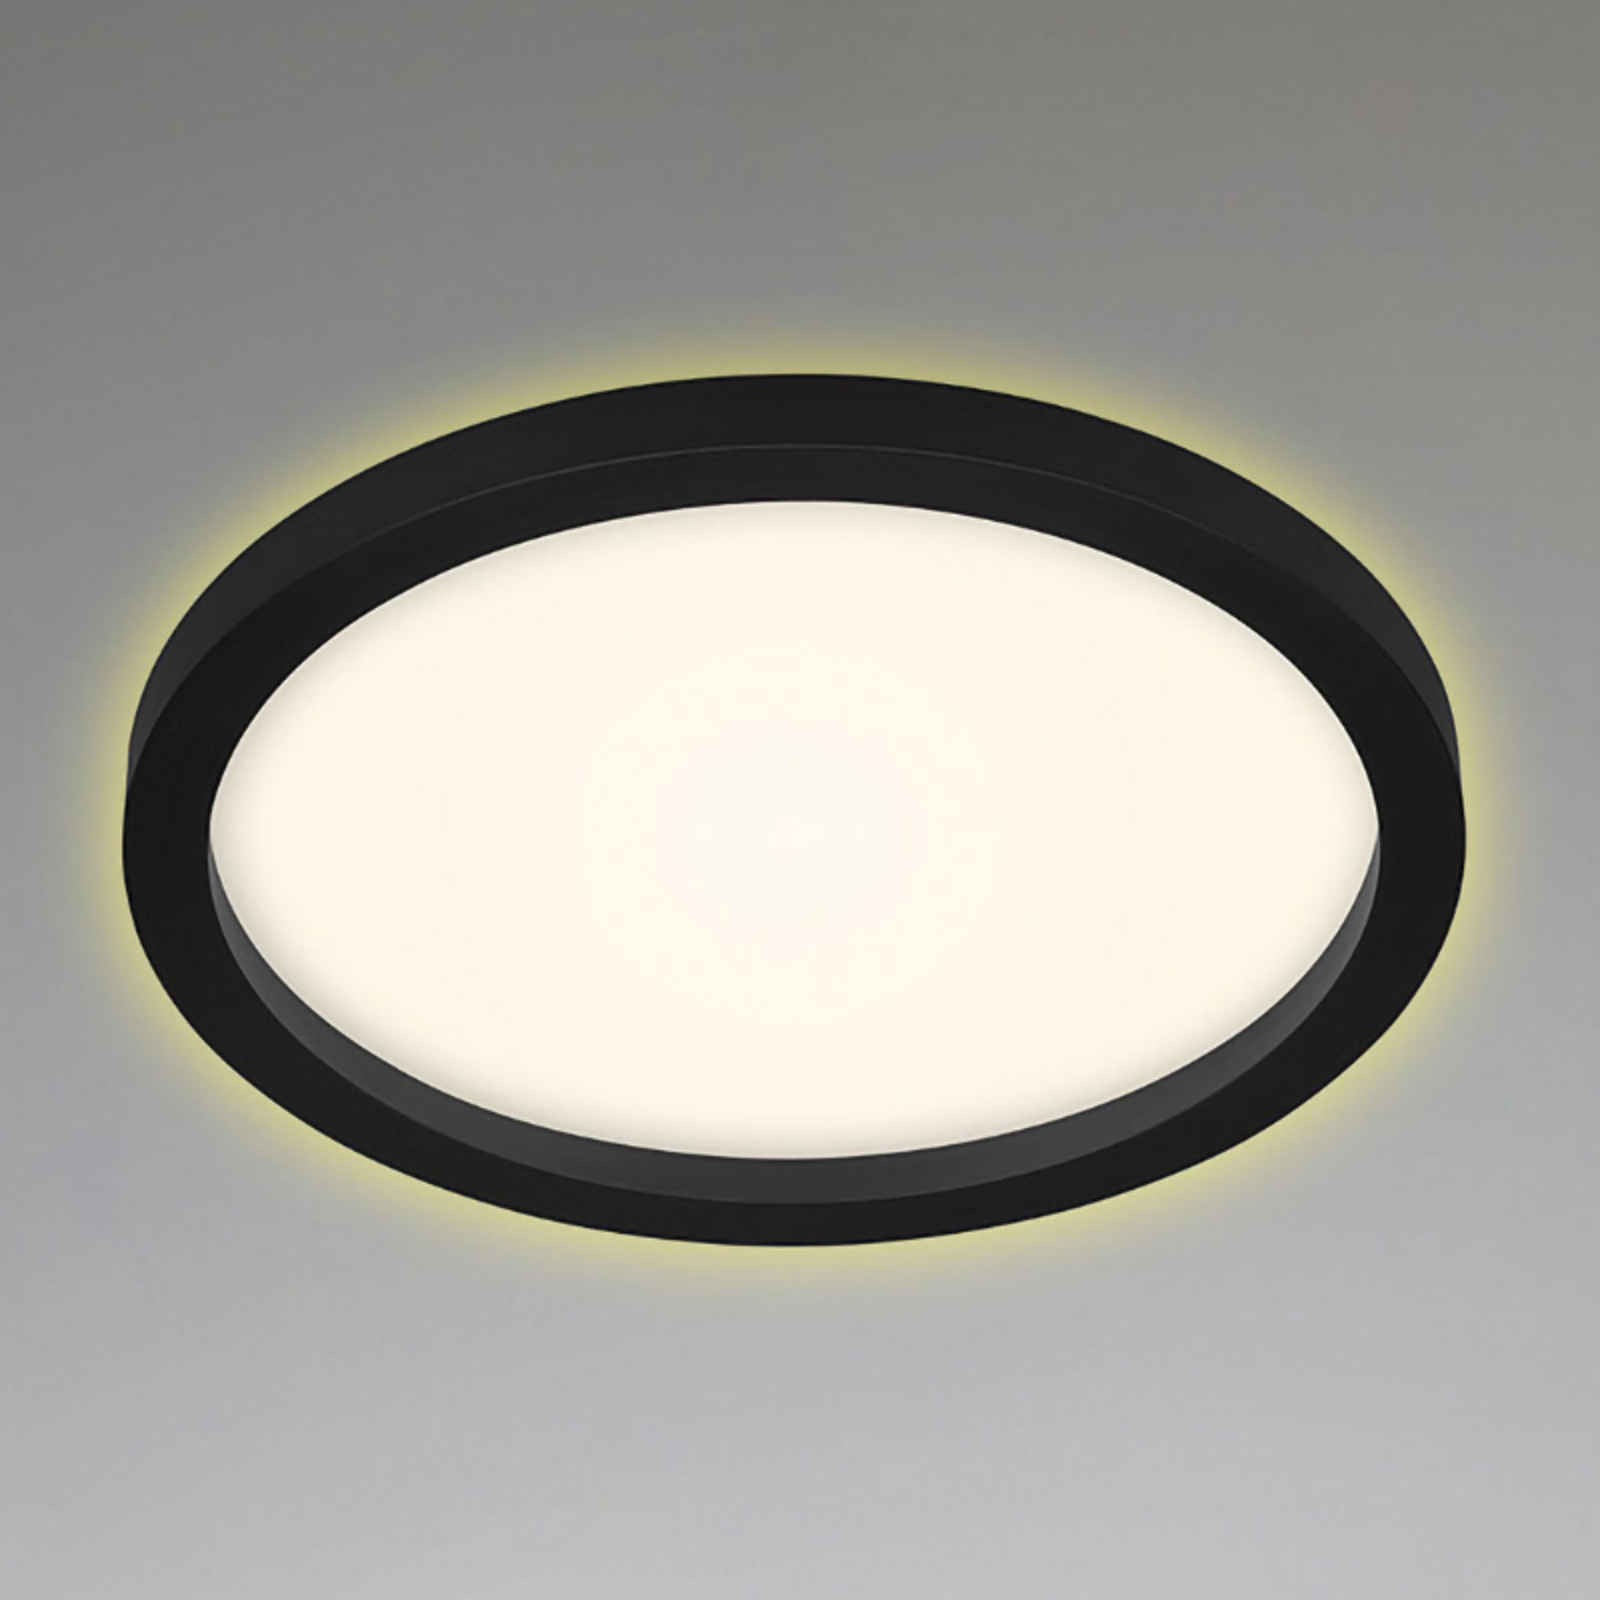 LED-taklampe 7361, Ø29cm svart